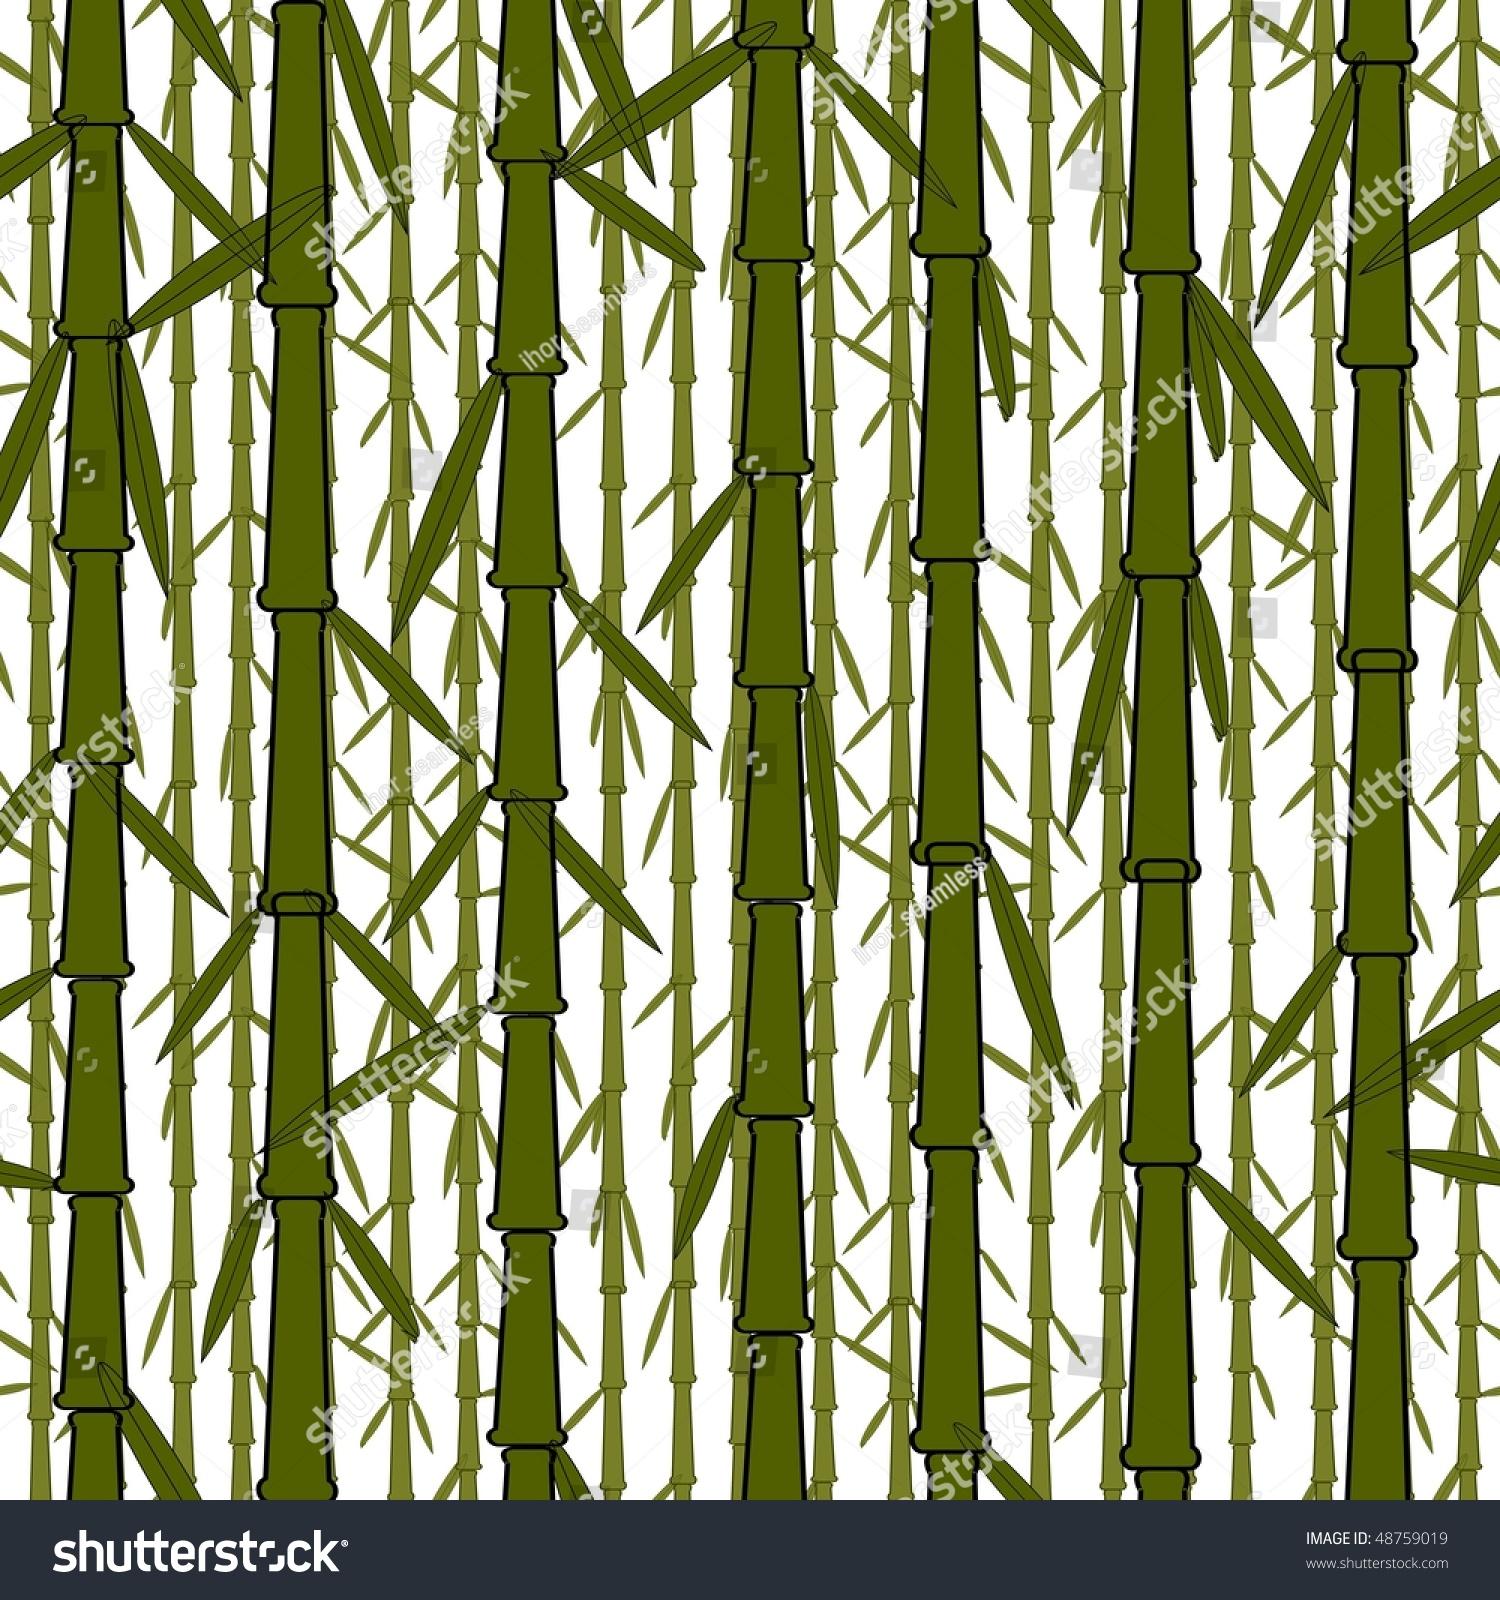 Seamless Wallpaper Chinese Bamboo Trees Stock Illustration 48759019